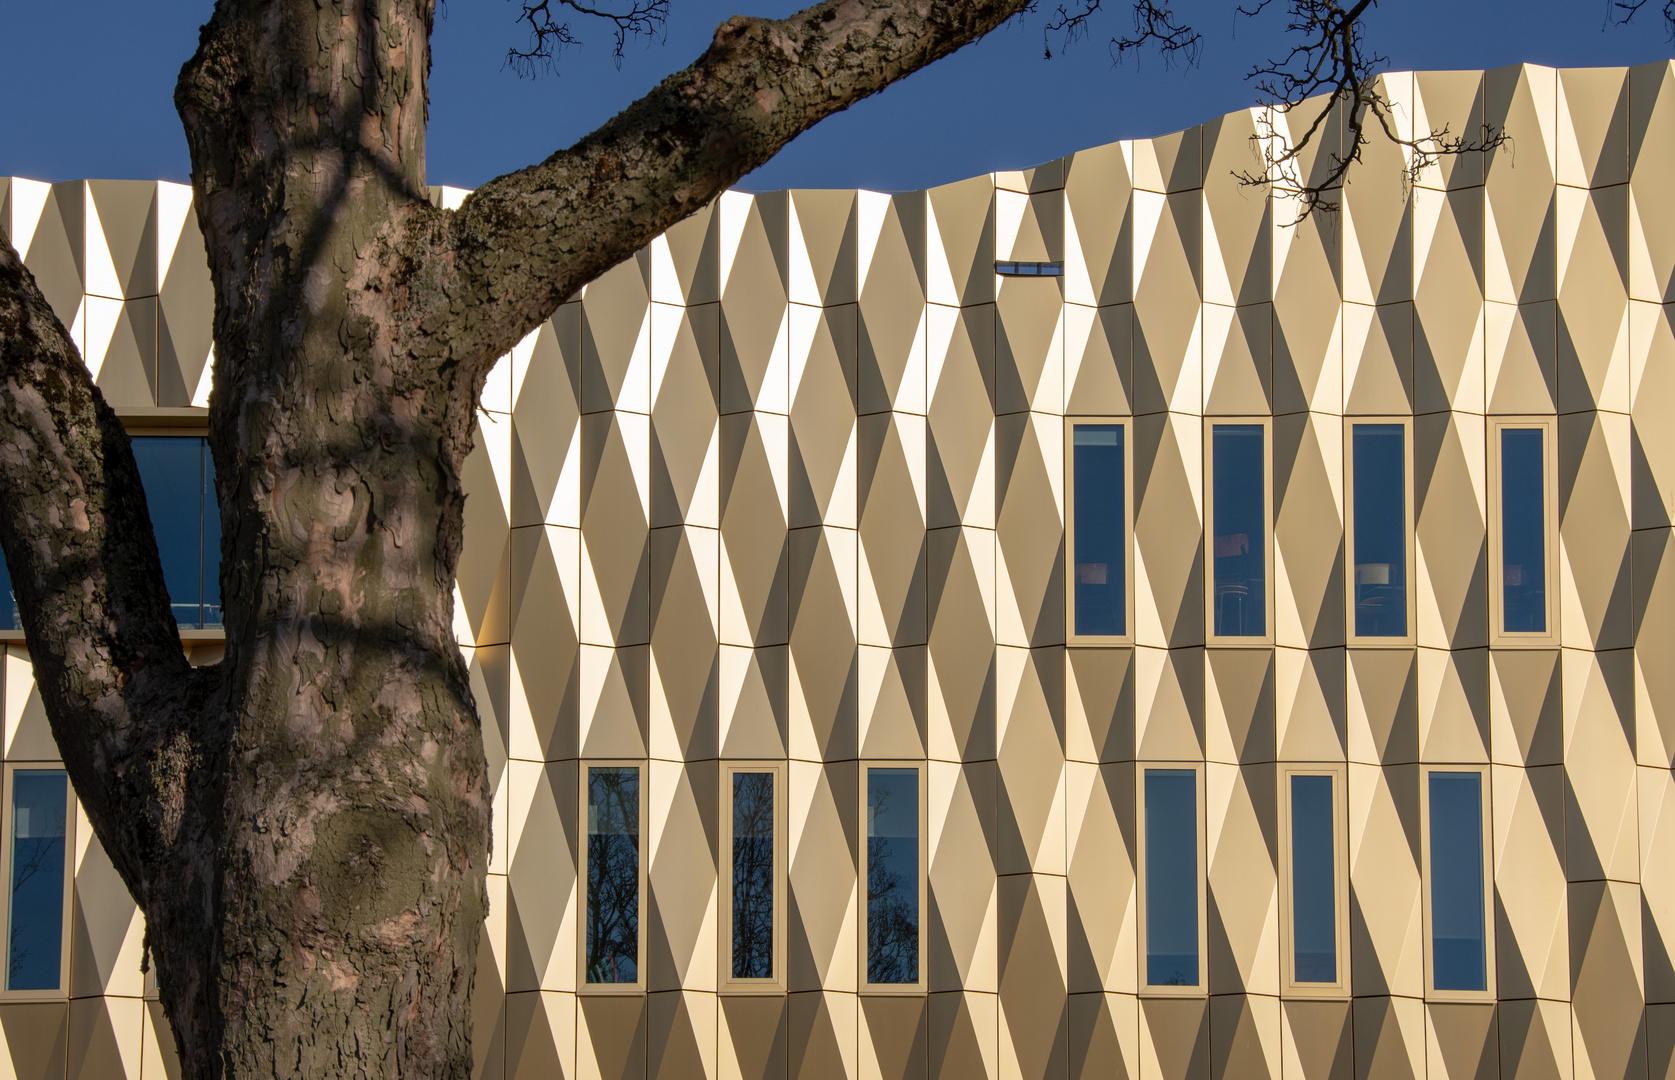 Tiel - Kerkstraat - Library - 03